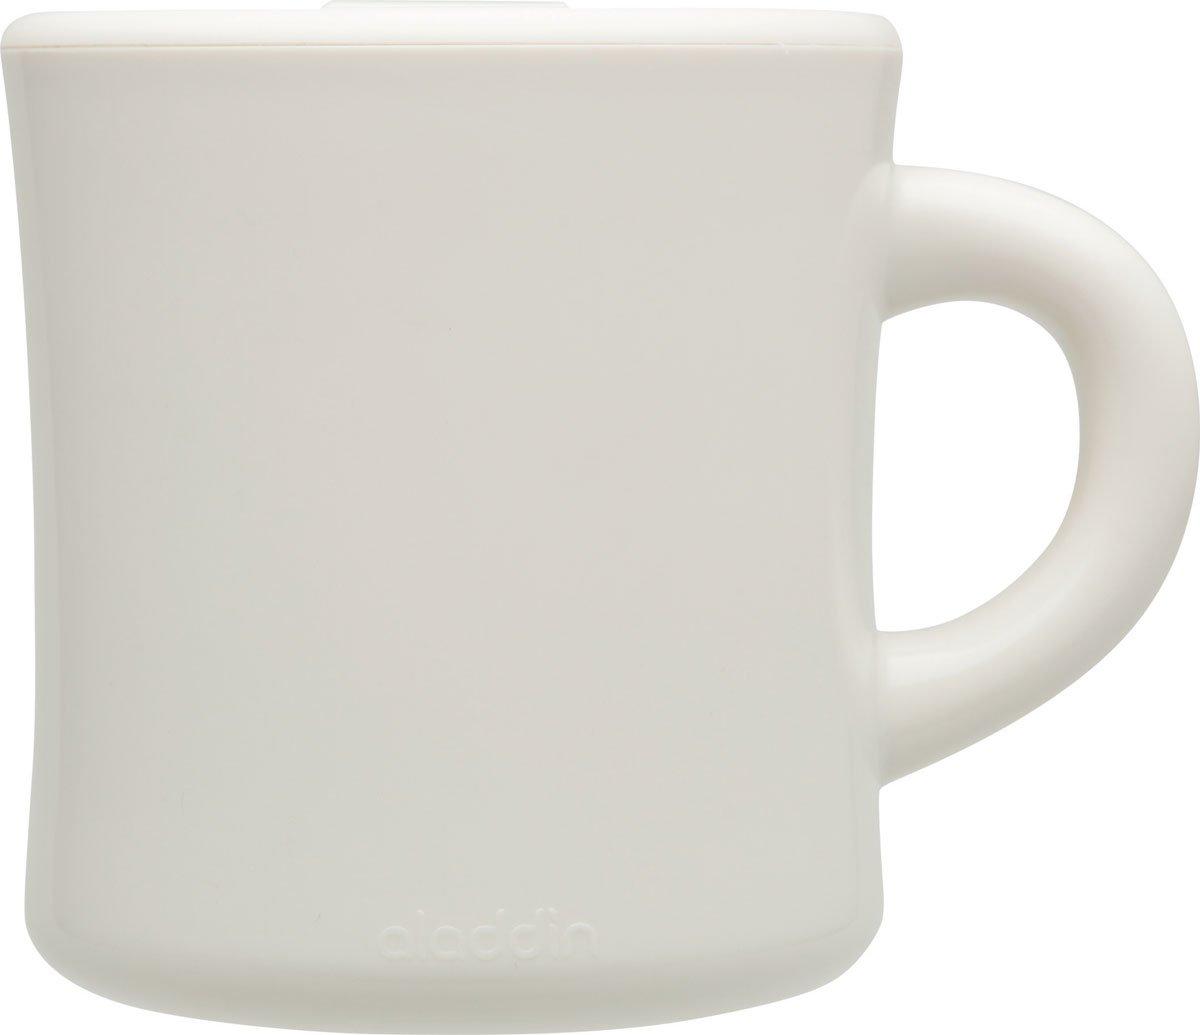 Amazon aladdin coffee mugs - Amazon Com Aladdin Insulated Diner Mug 16oz Cream Aladdin Mug Coffee Cups Mugs